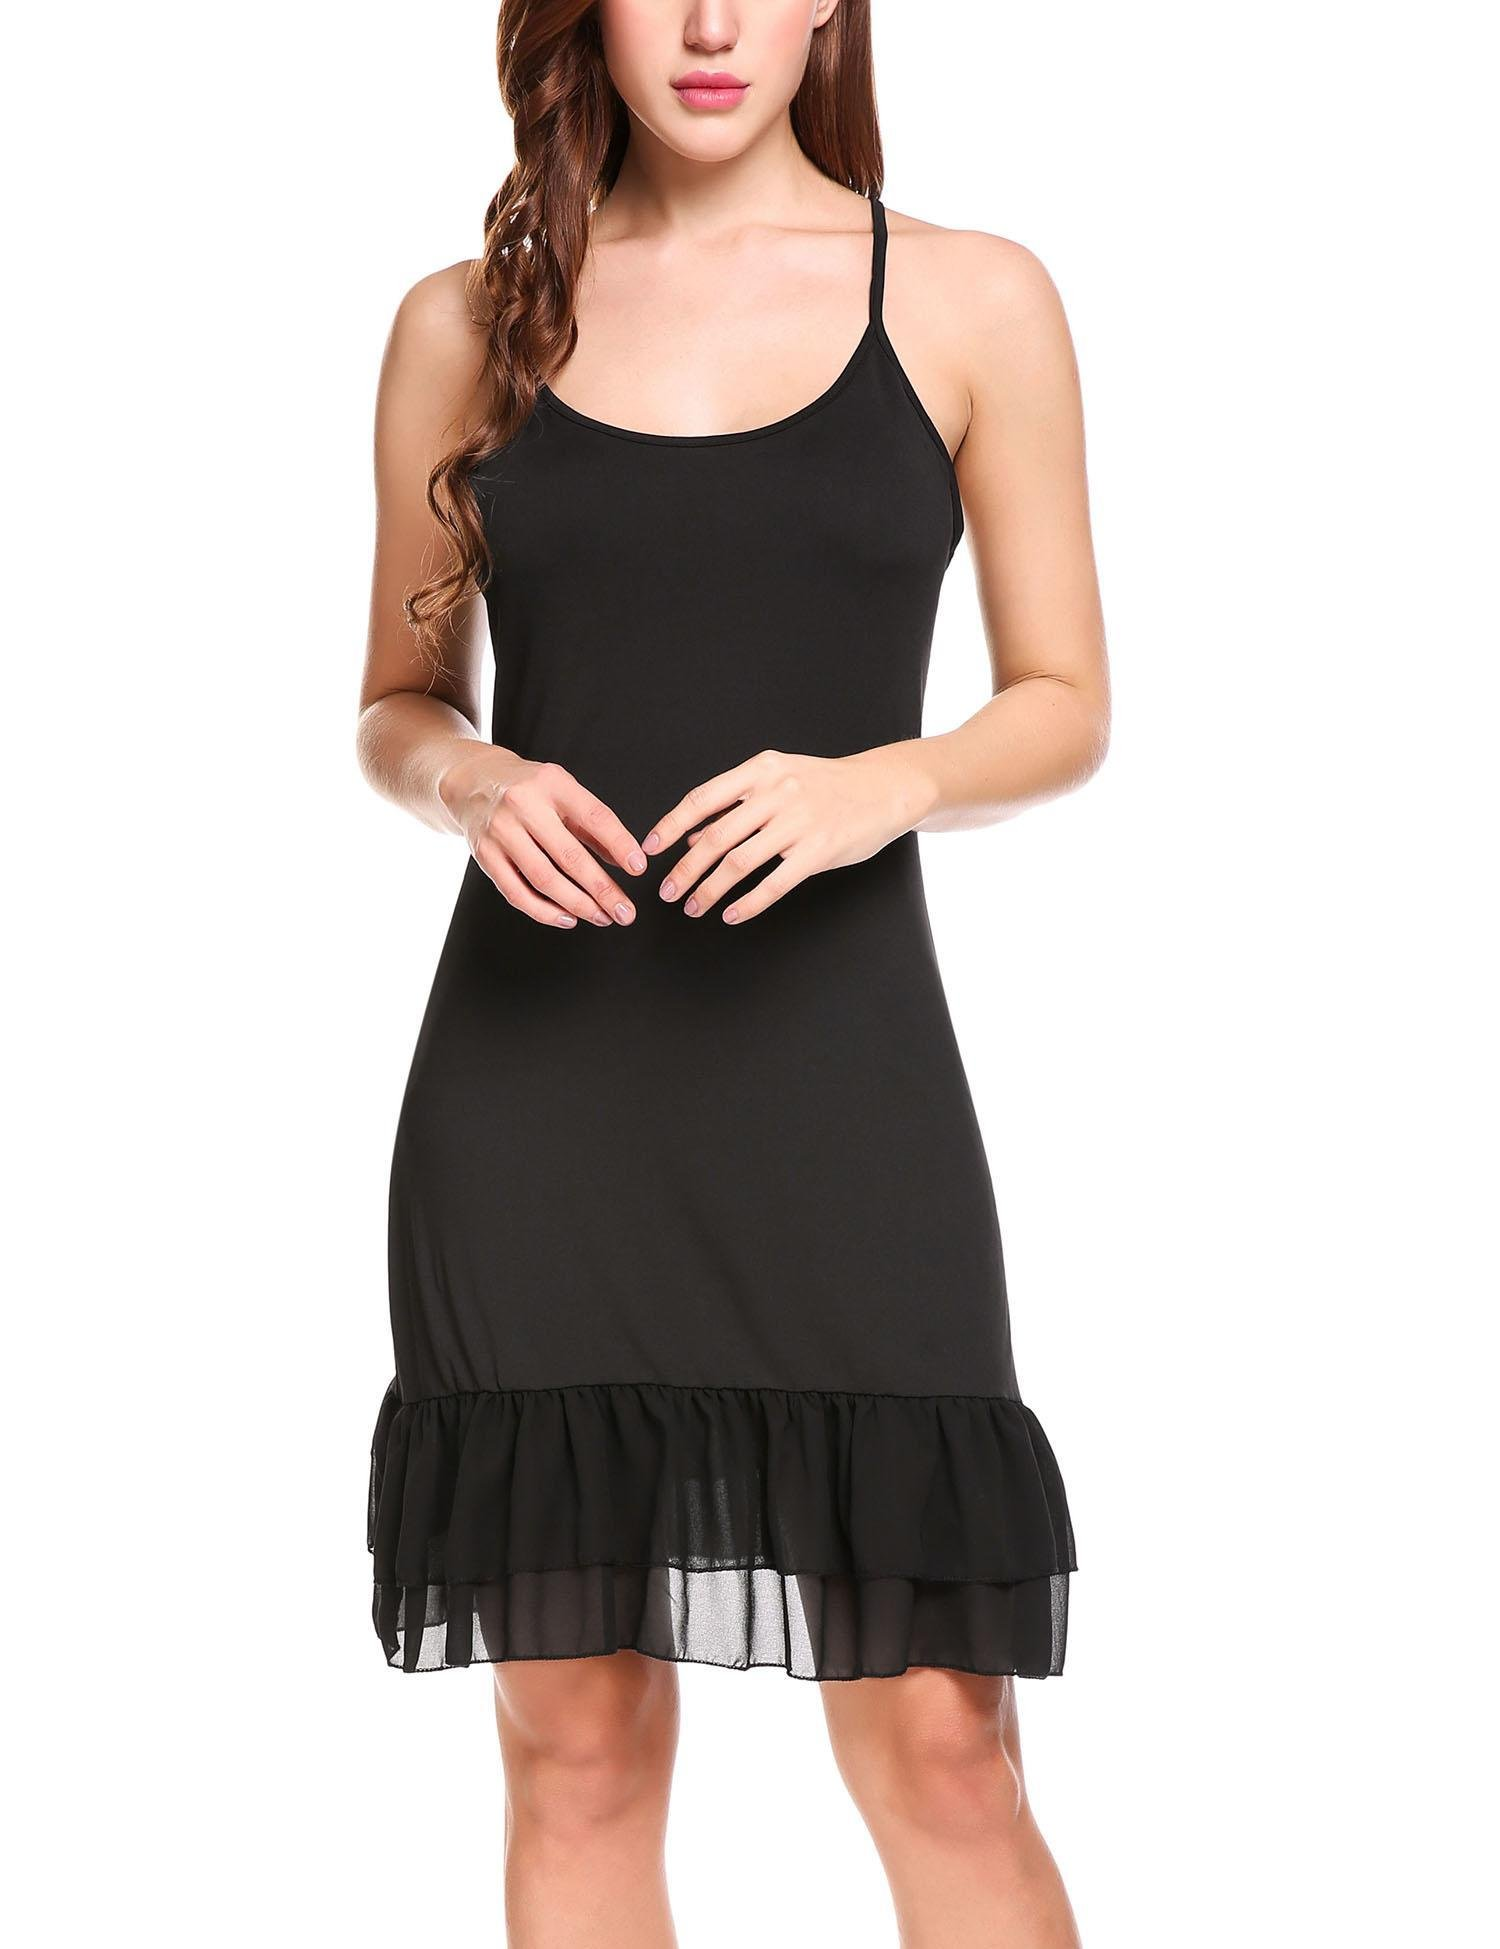 Chiffon Ruffle Camisole Dress Extender for Women Under Adjustable Spaghetti Strap Lace Cami